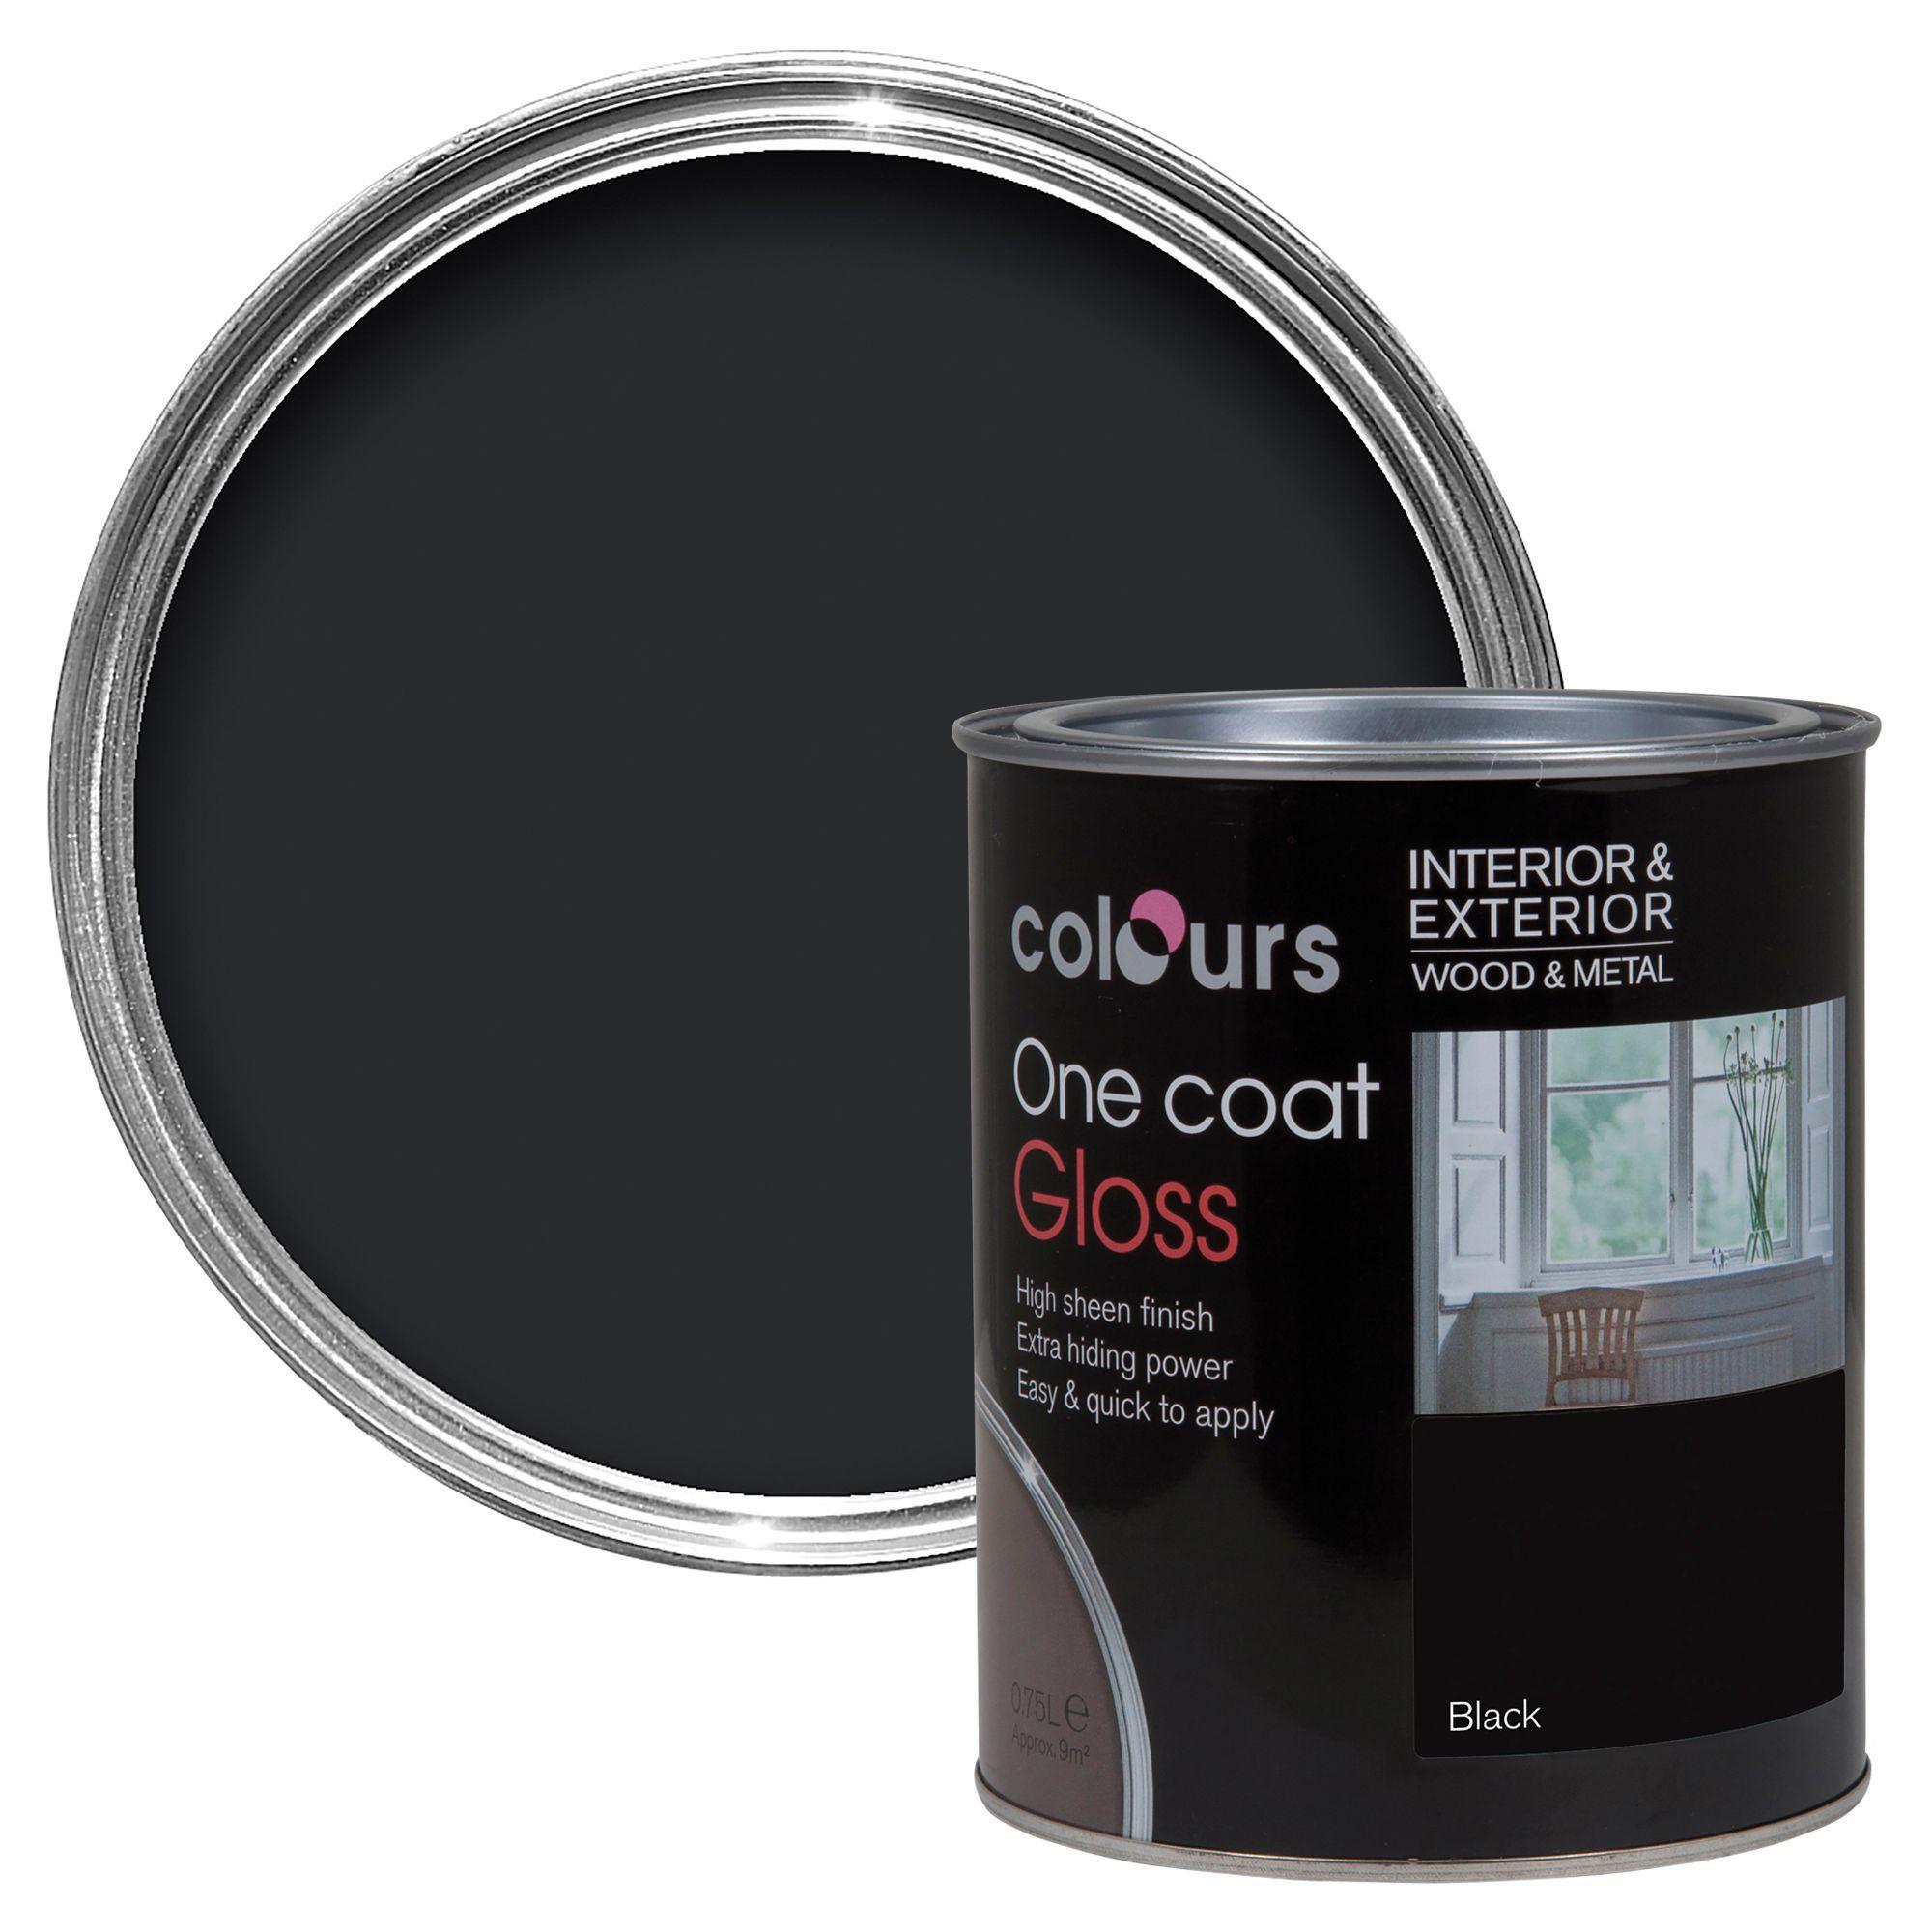 Colours One Coat Interior & Exterior Black Gloss Wood & Metal Paint 750ml